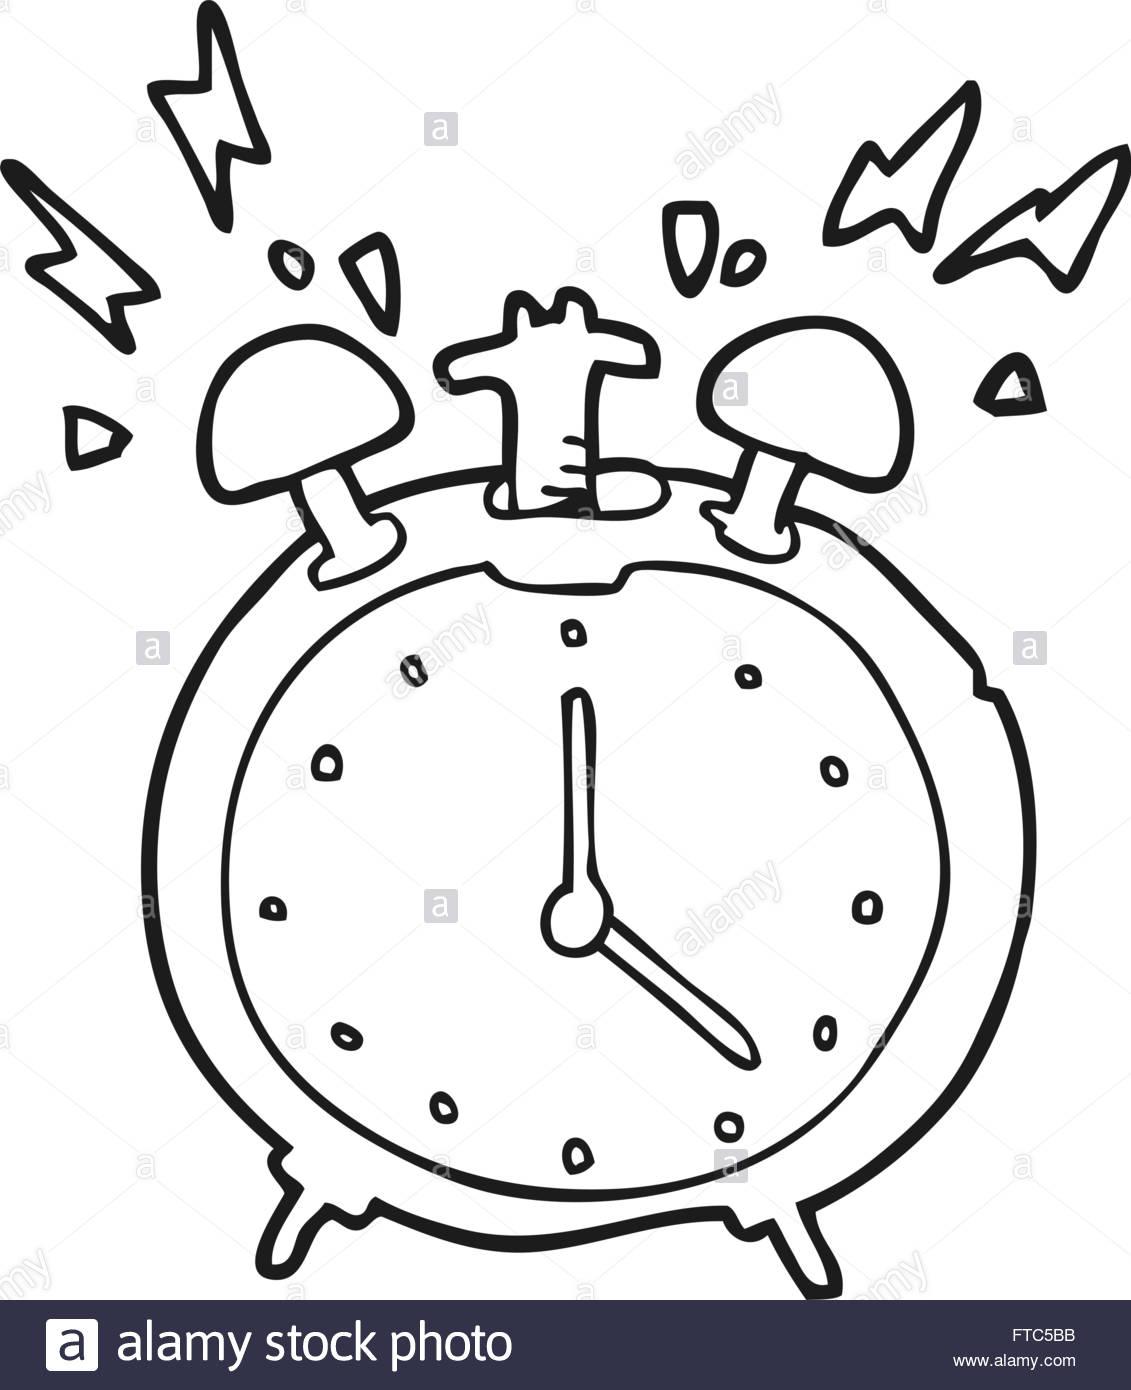 1131x1390 Freehand Drawn Black And White Cartoon Ringing Alarm Clock Stock